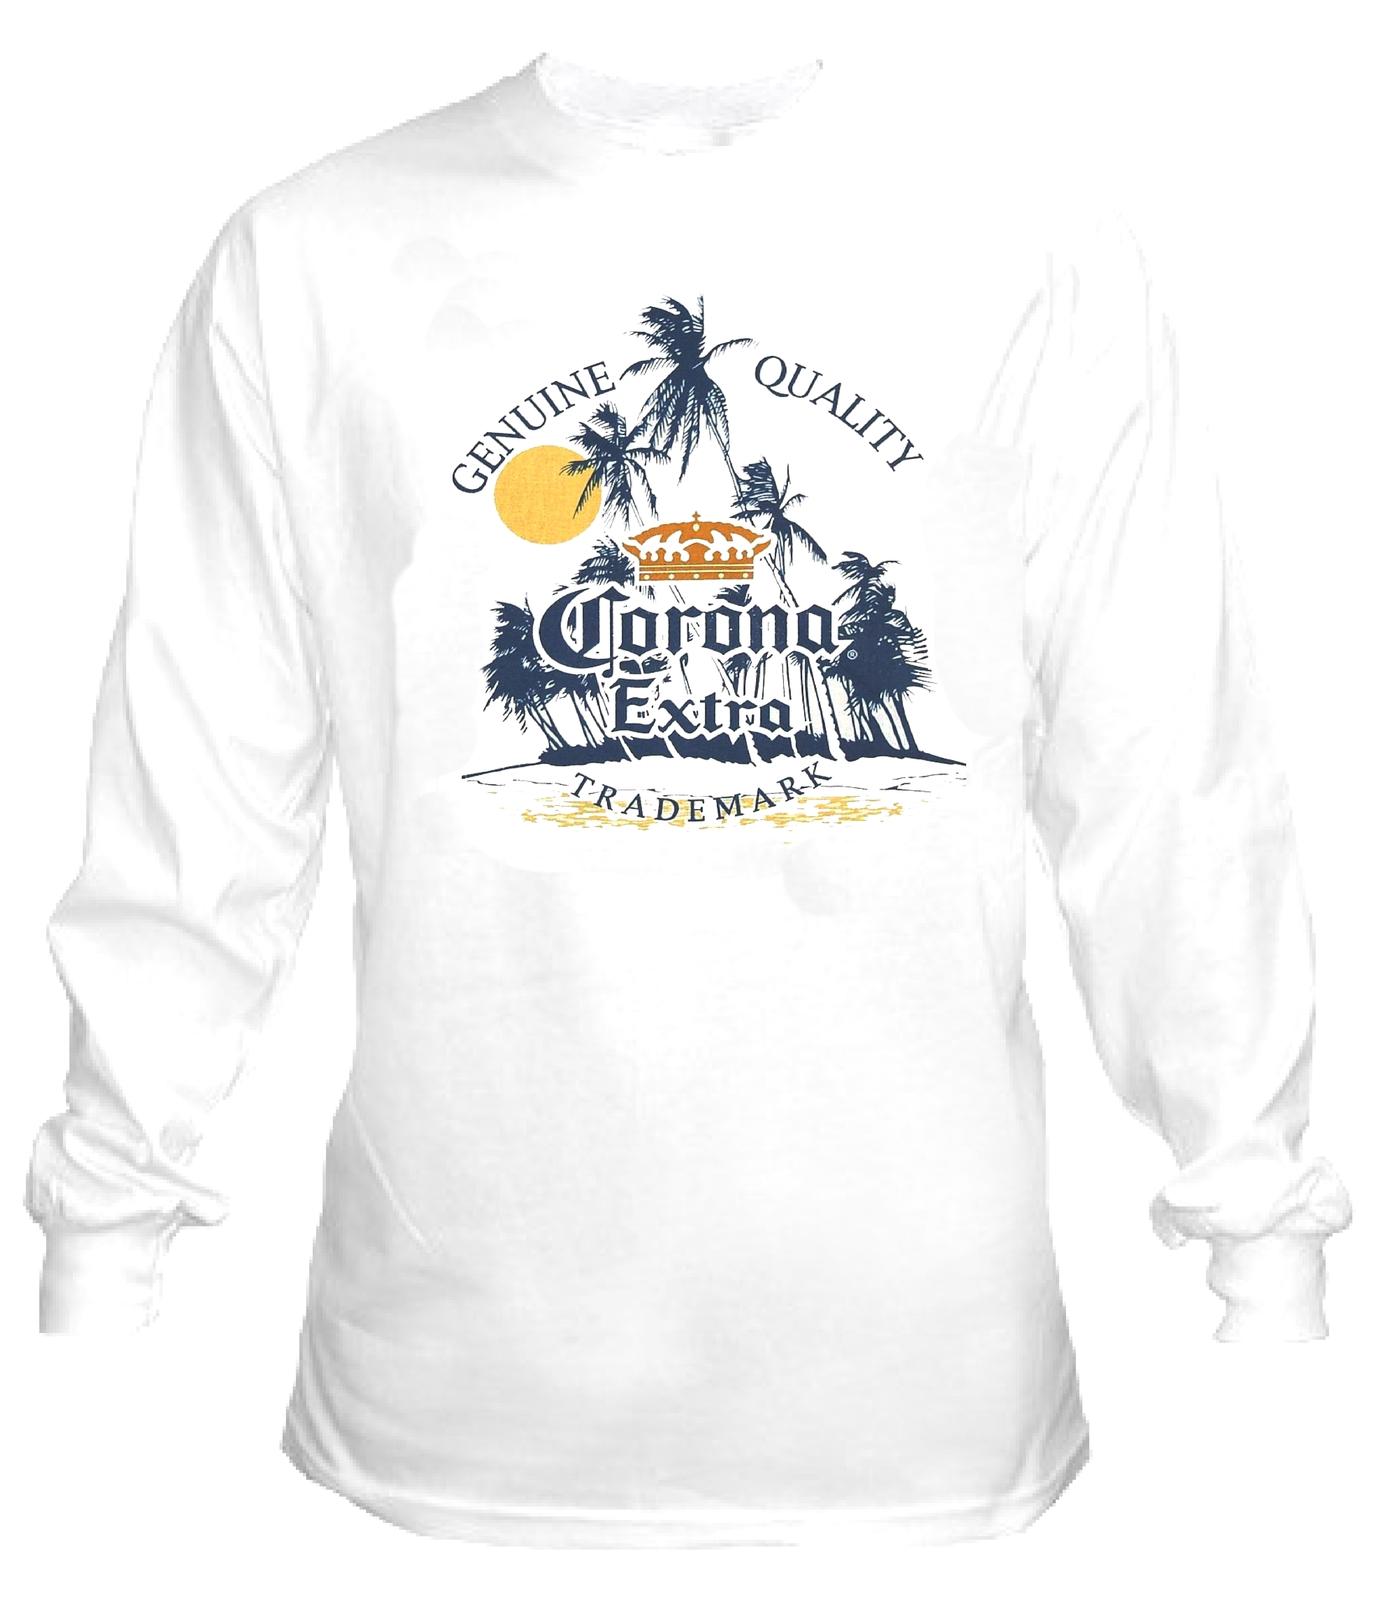 Corona Extra Long Sleeve Beer T Shirt S M L Xl 2xl 3xl 4xl